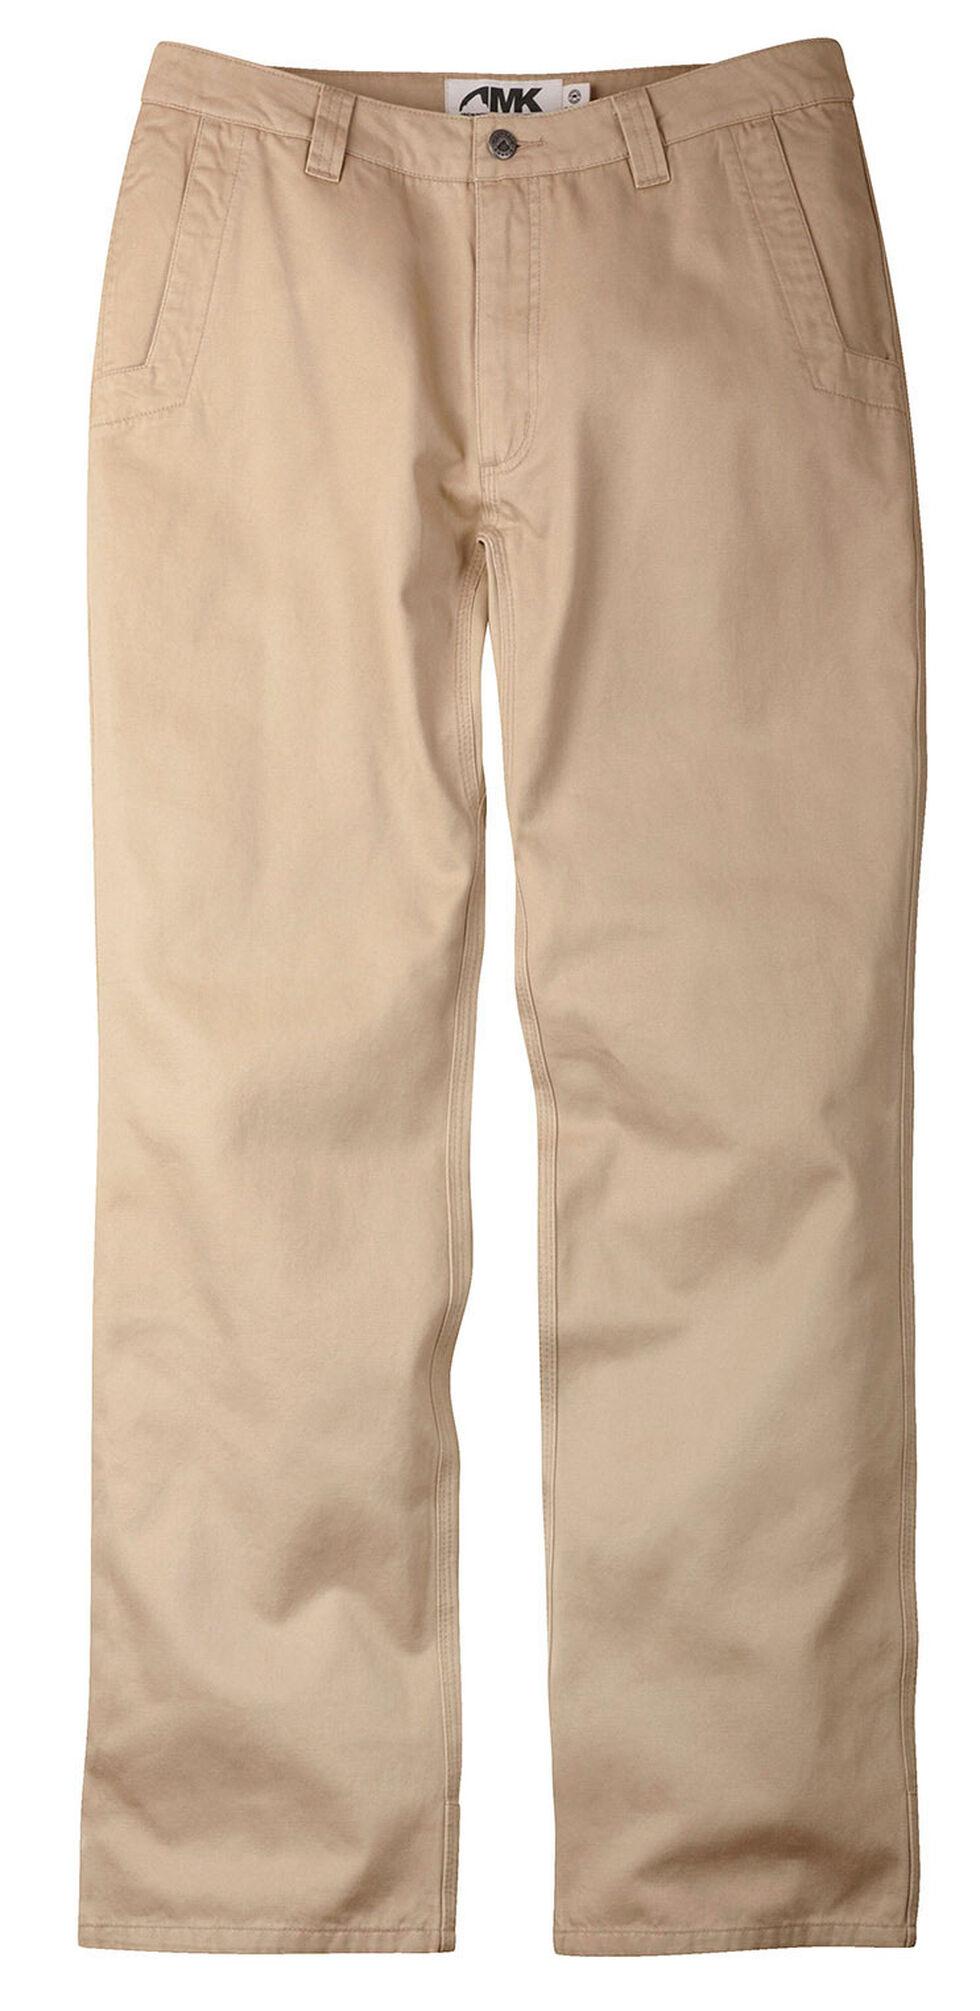 Mountain Khakis Men's Teton Slim Fit Pants, Beige, hi-res